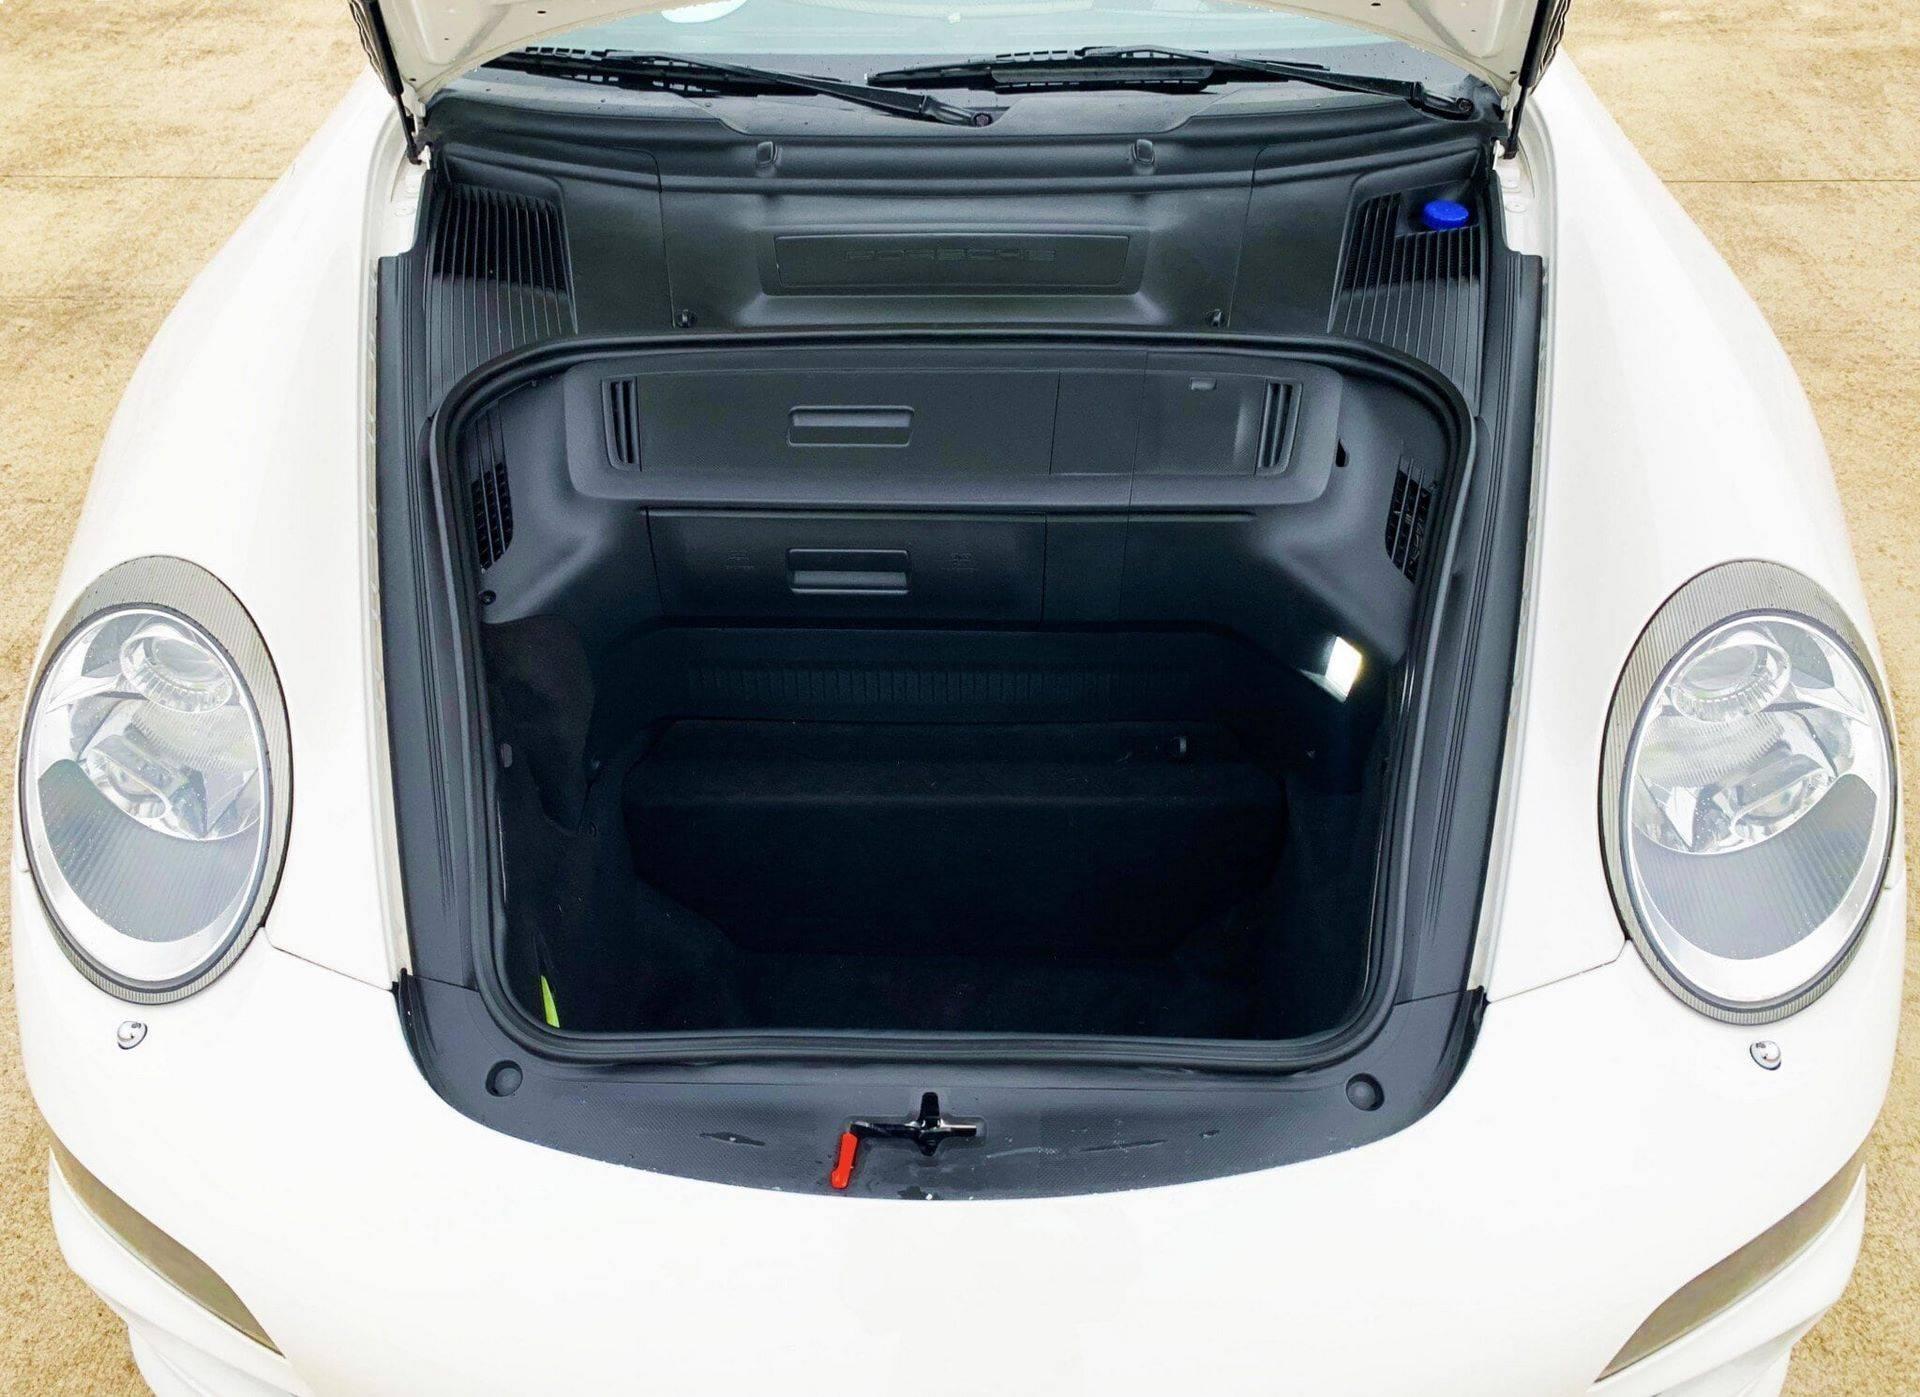 Center-Seat-Porsche-911-Carrera-S-2008-8